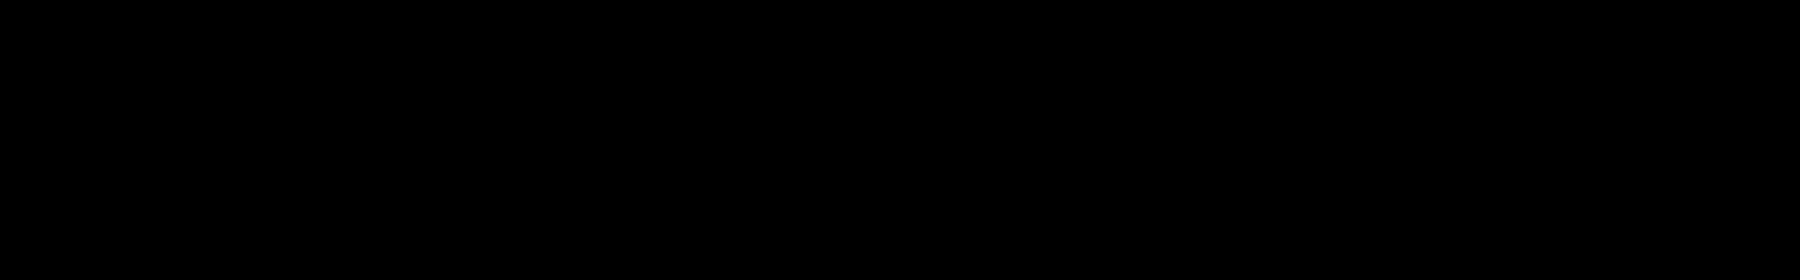 Psytrance Ecstasy audio waveform